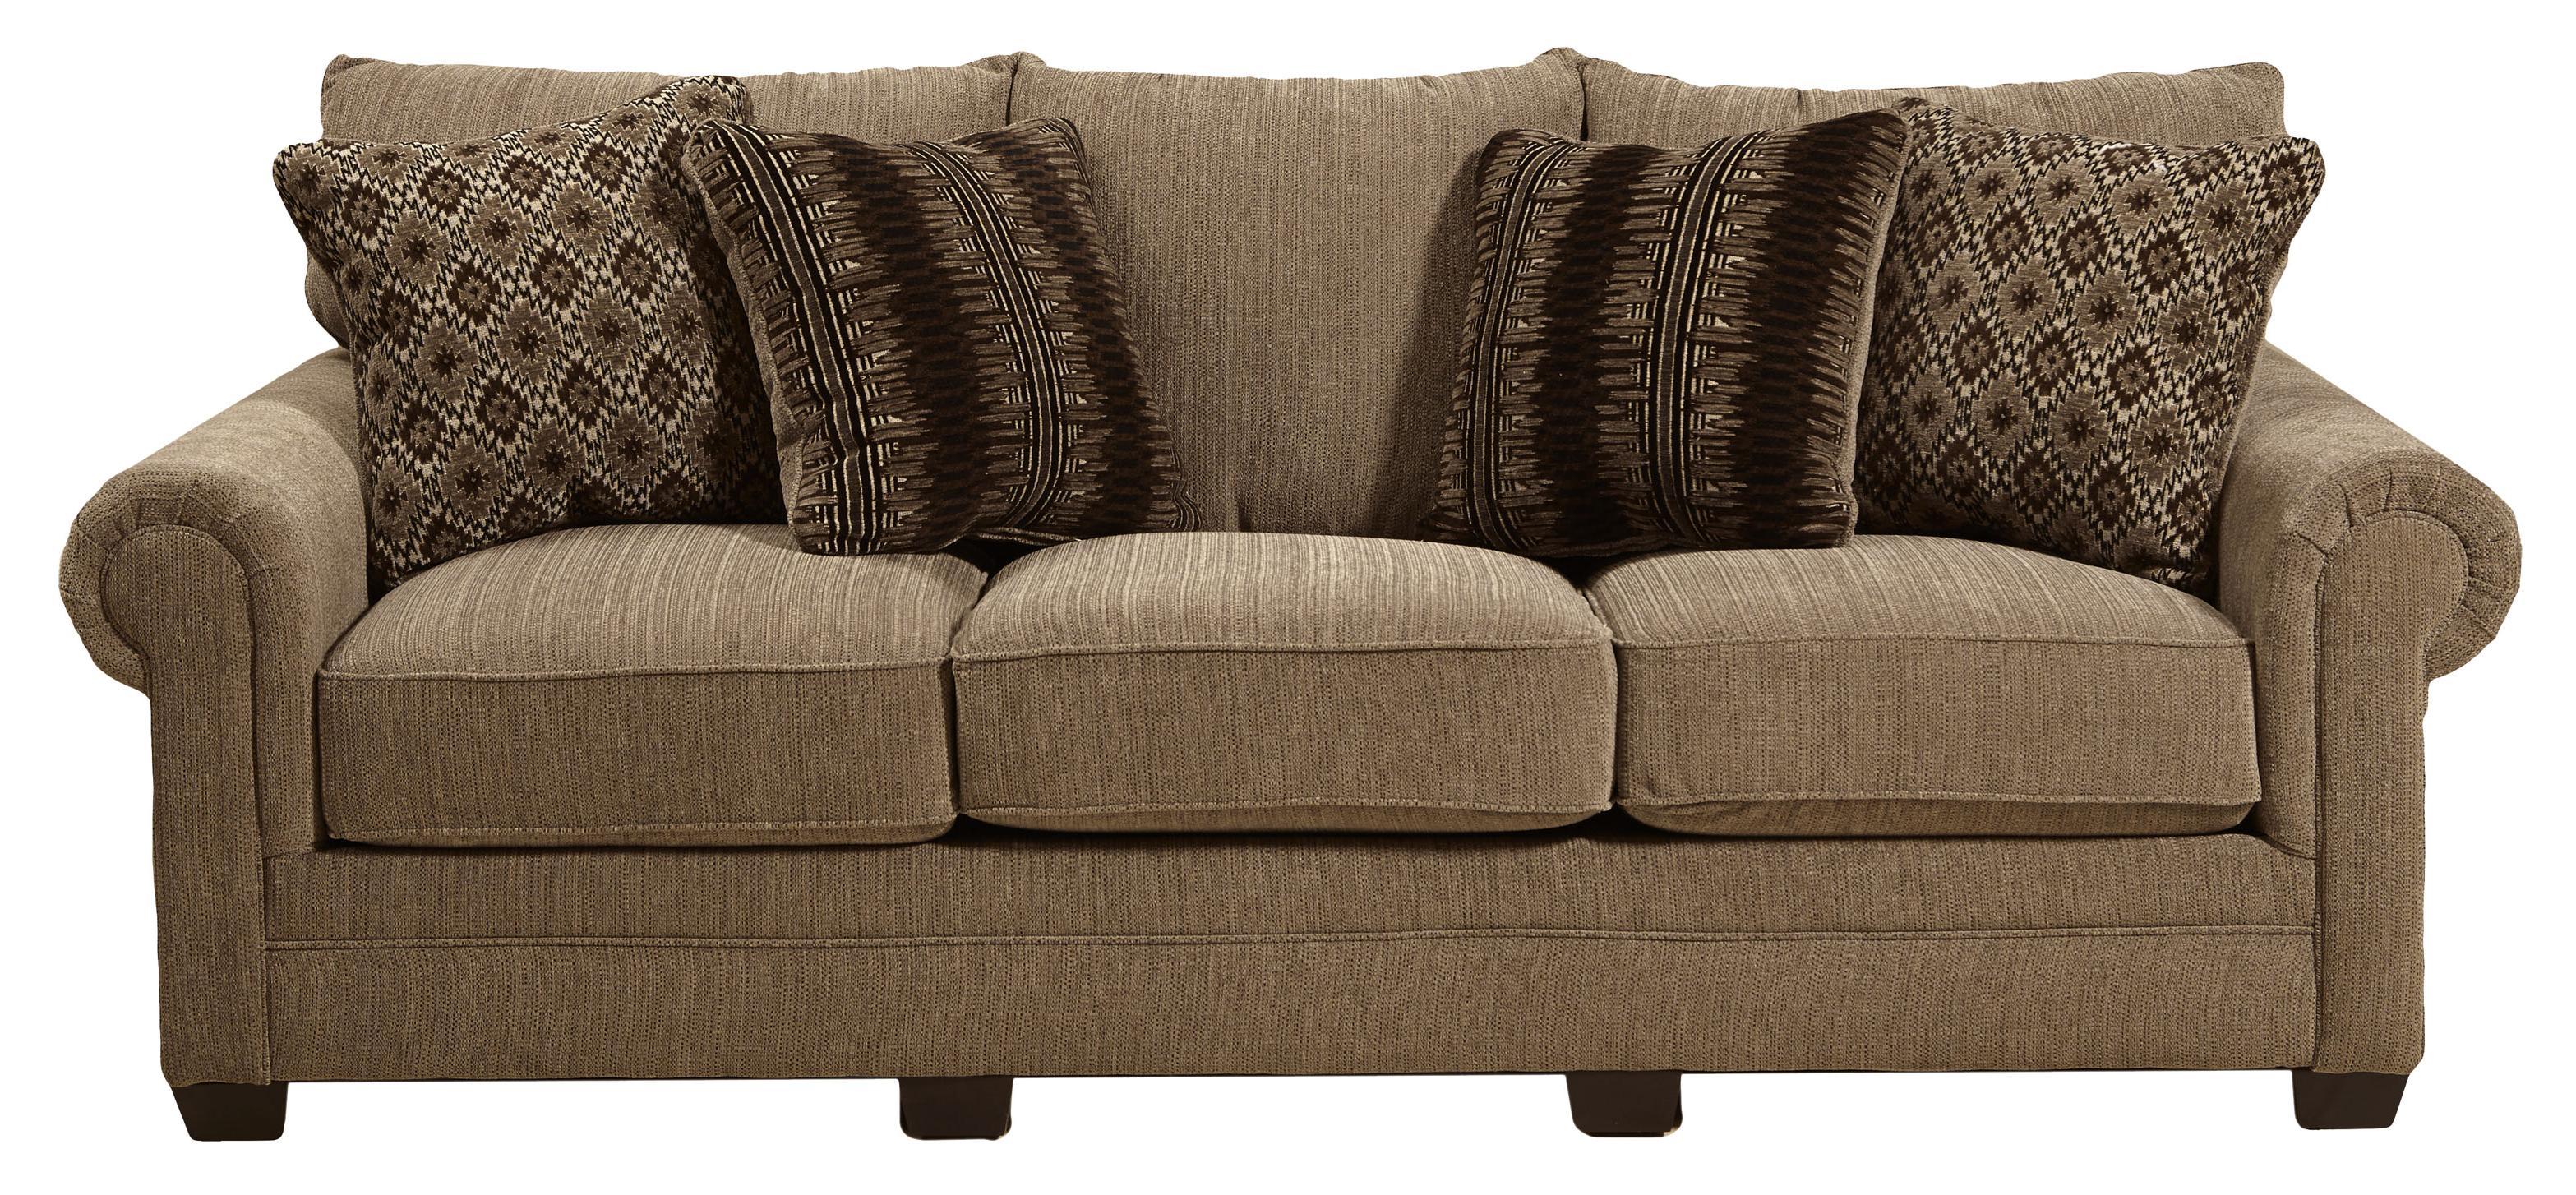 Jackson Furniture Anniston Stationary Sofa - Item Number: 4342-03-Anniston_Fawn